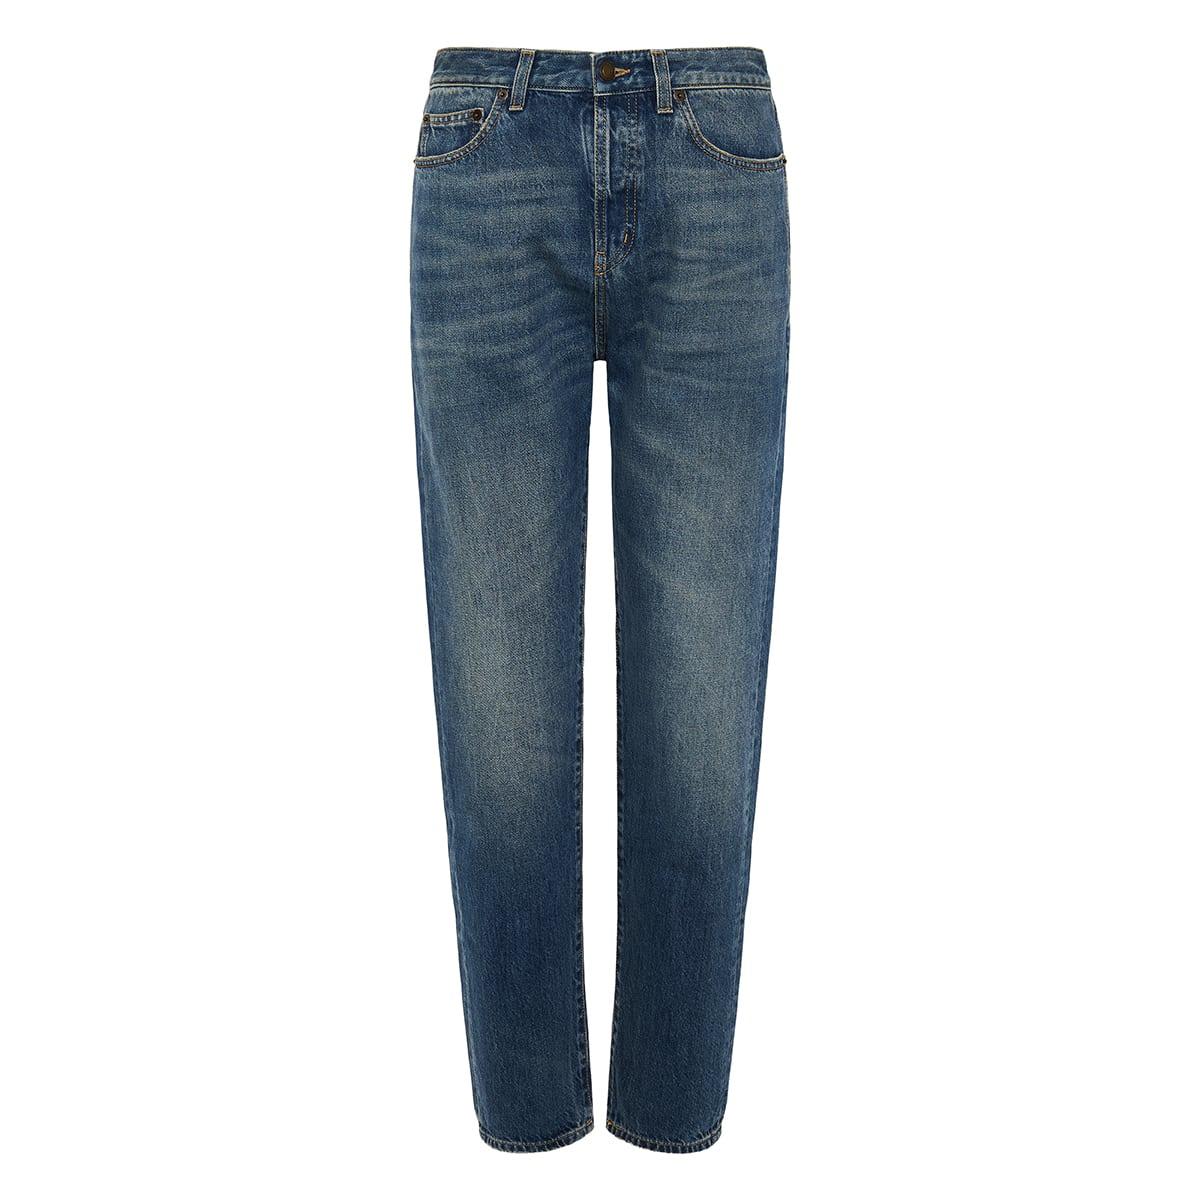 High-waist distressed jeans